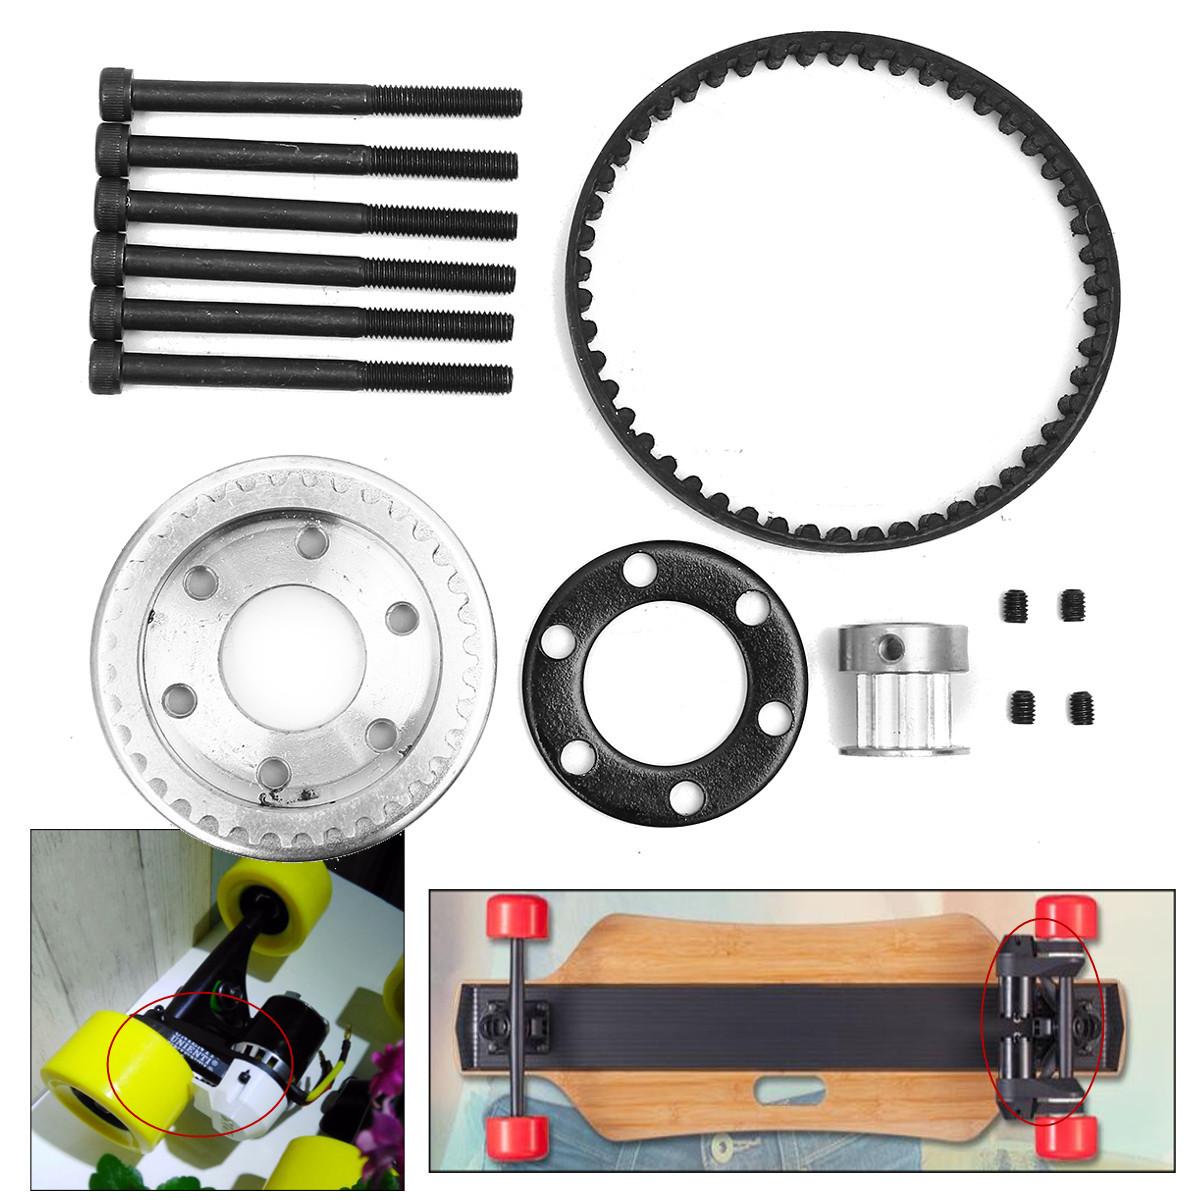 Best ideas about DIY Electric Skateboard Kit . Save or Pin DIY Electric Skateboard Parts Pulleys And Motor Mount Kit Now.